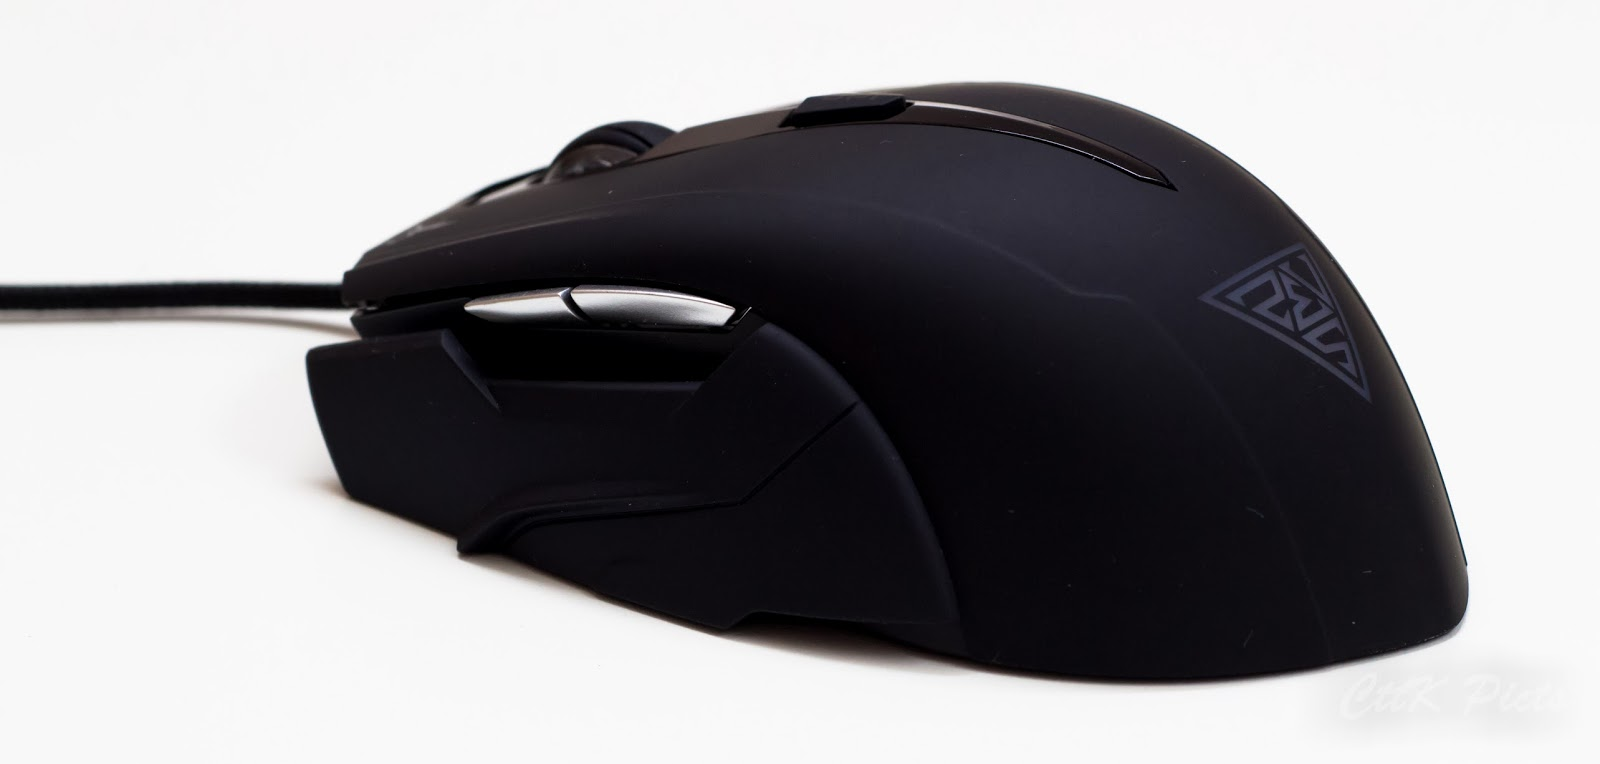 Gamdias Hades Extension Optical Gaming Mouse 65